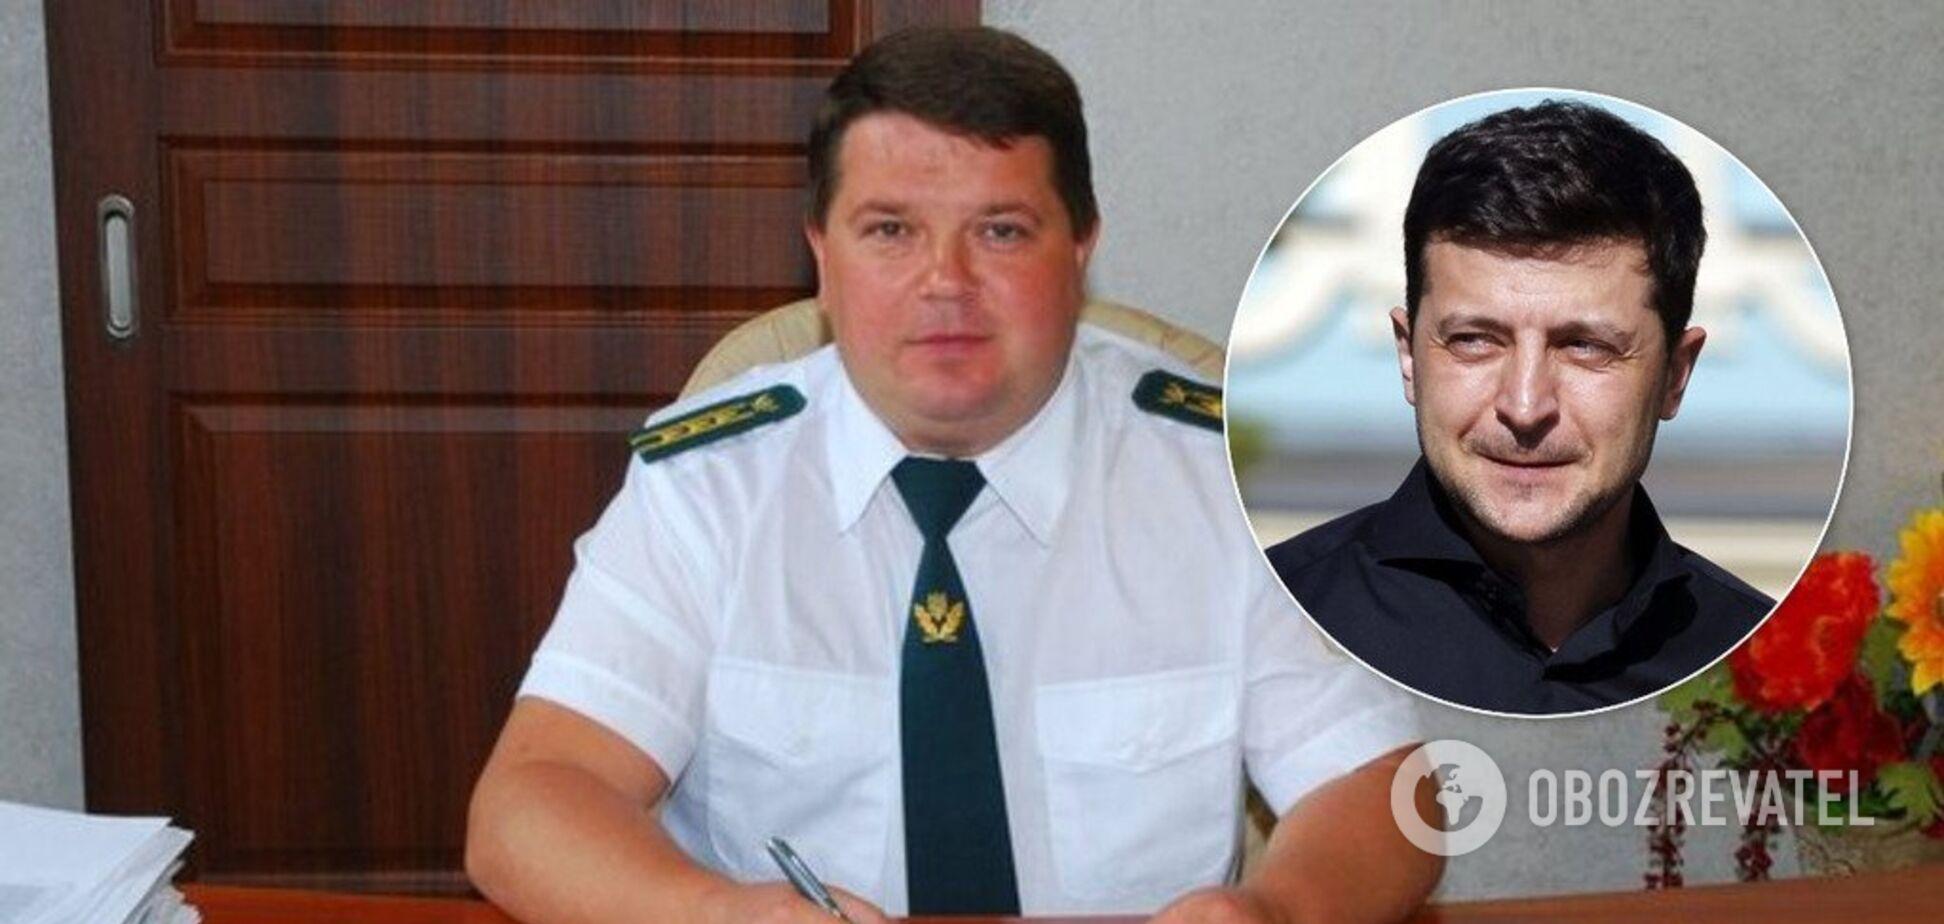 НАБУ задержало Виктора Сысу со взяткой